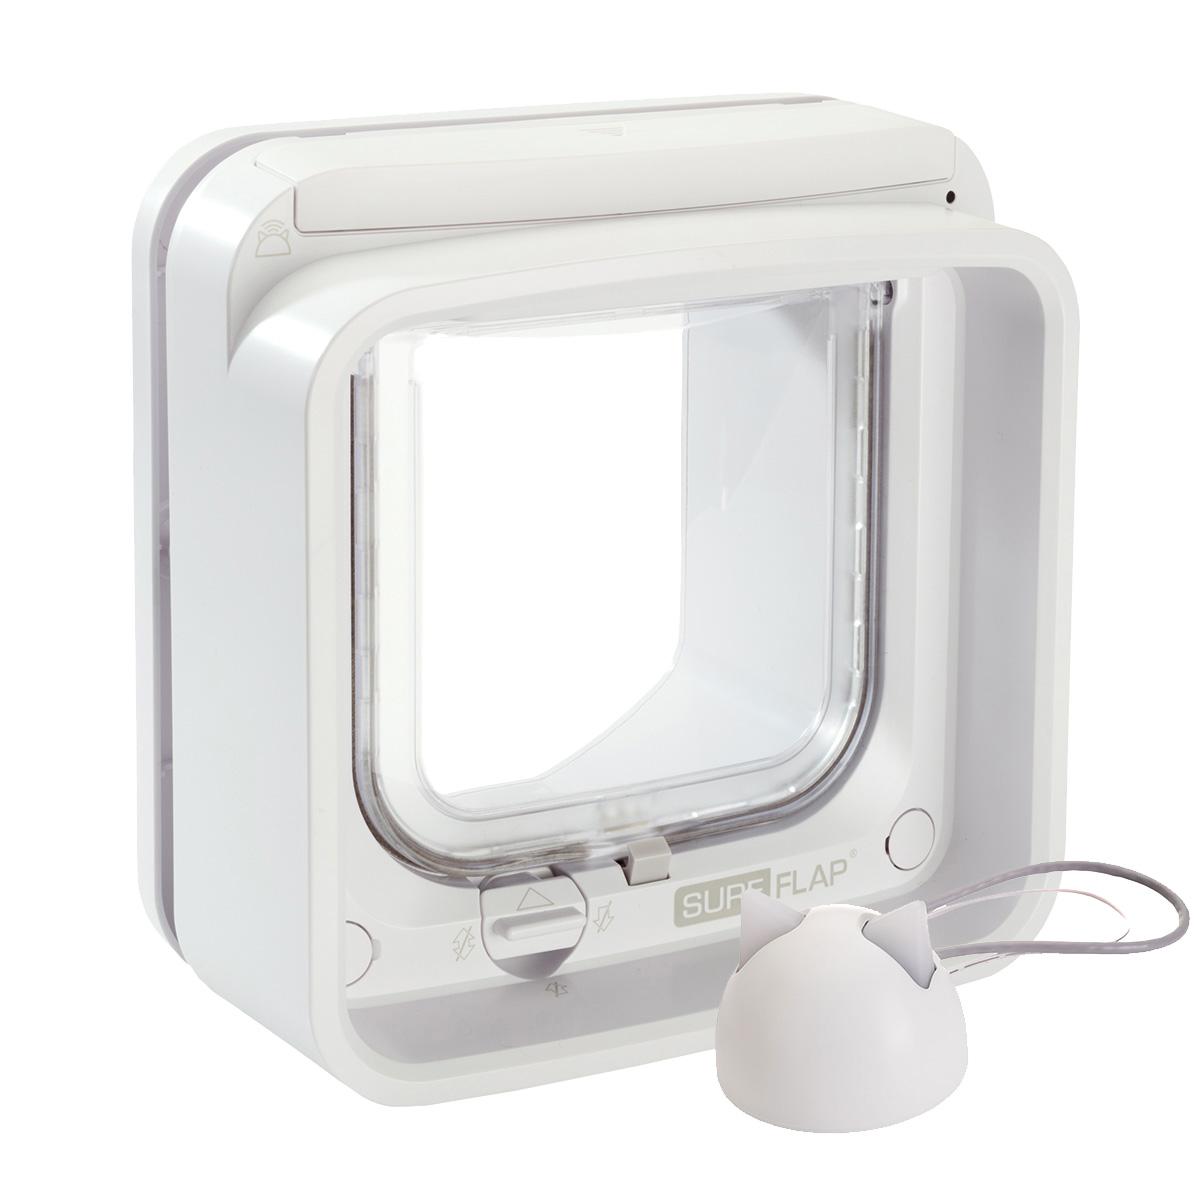 sureflap mikrochip katzenklappe connect hub kaufen bei. Black Bedroom Furniture Sets. Home Design Ideas